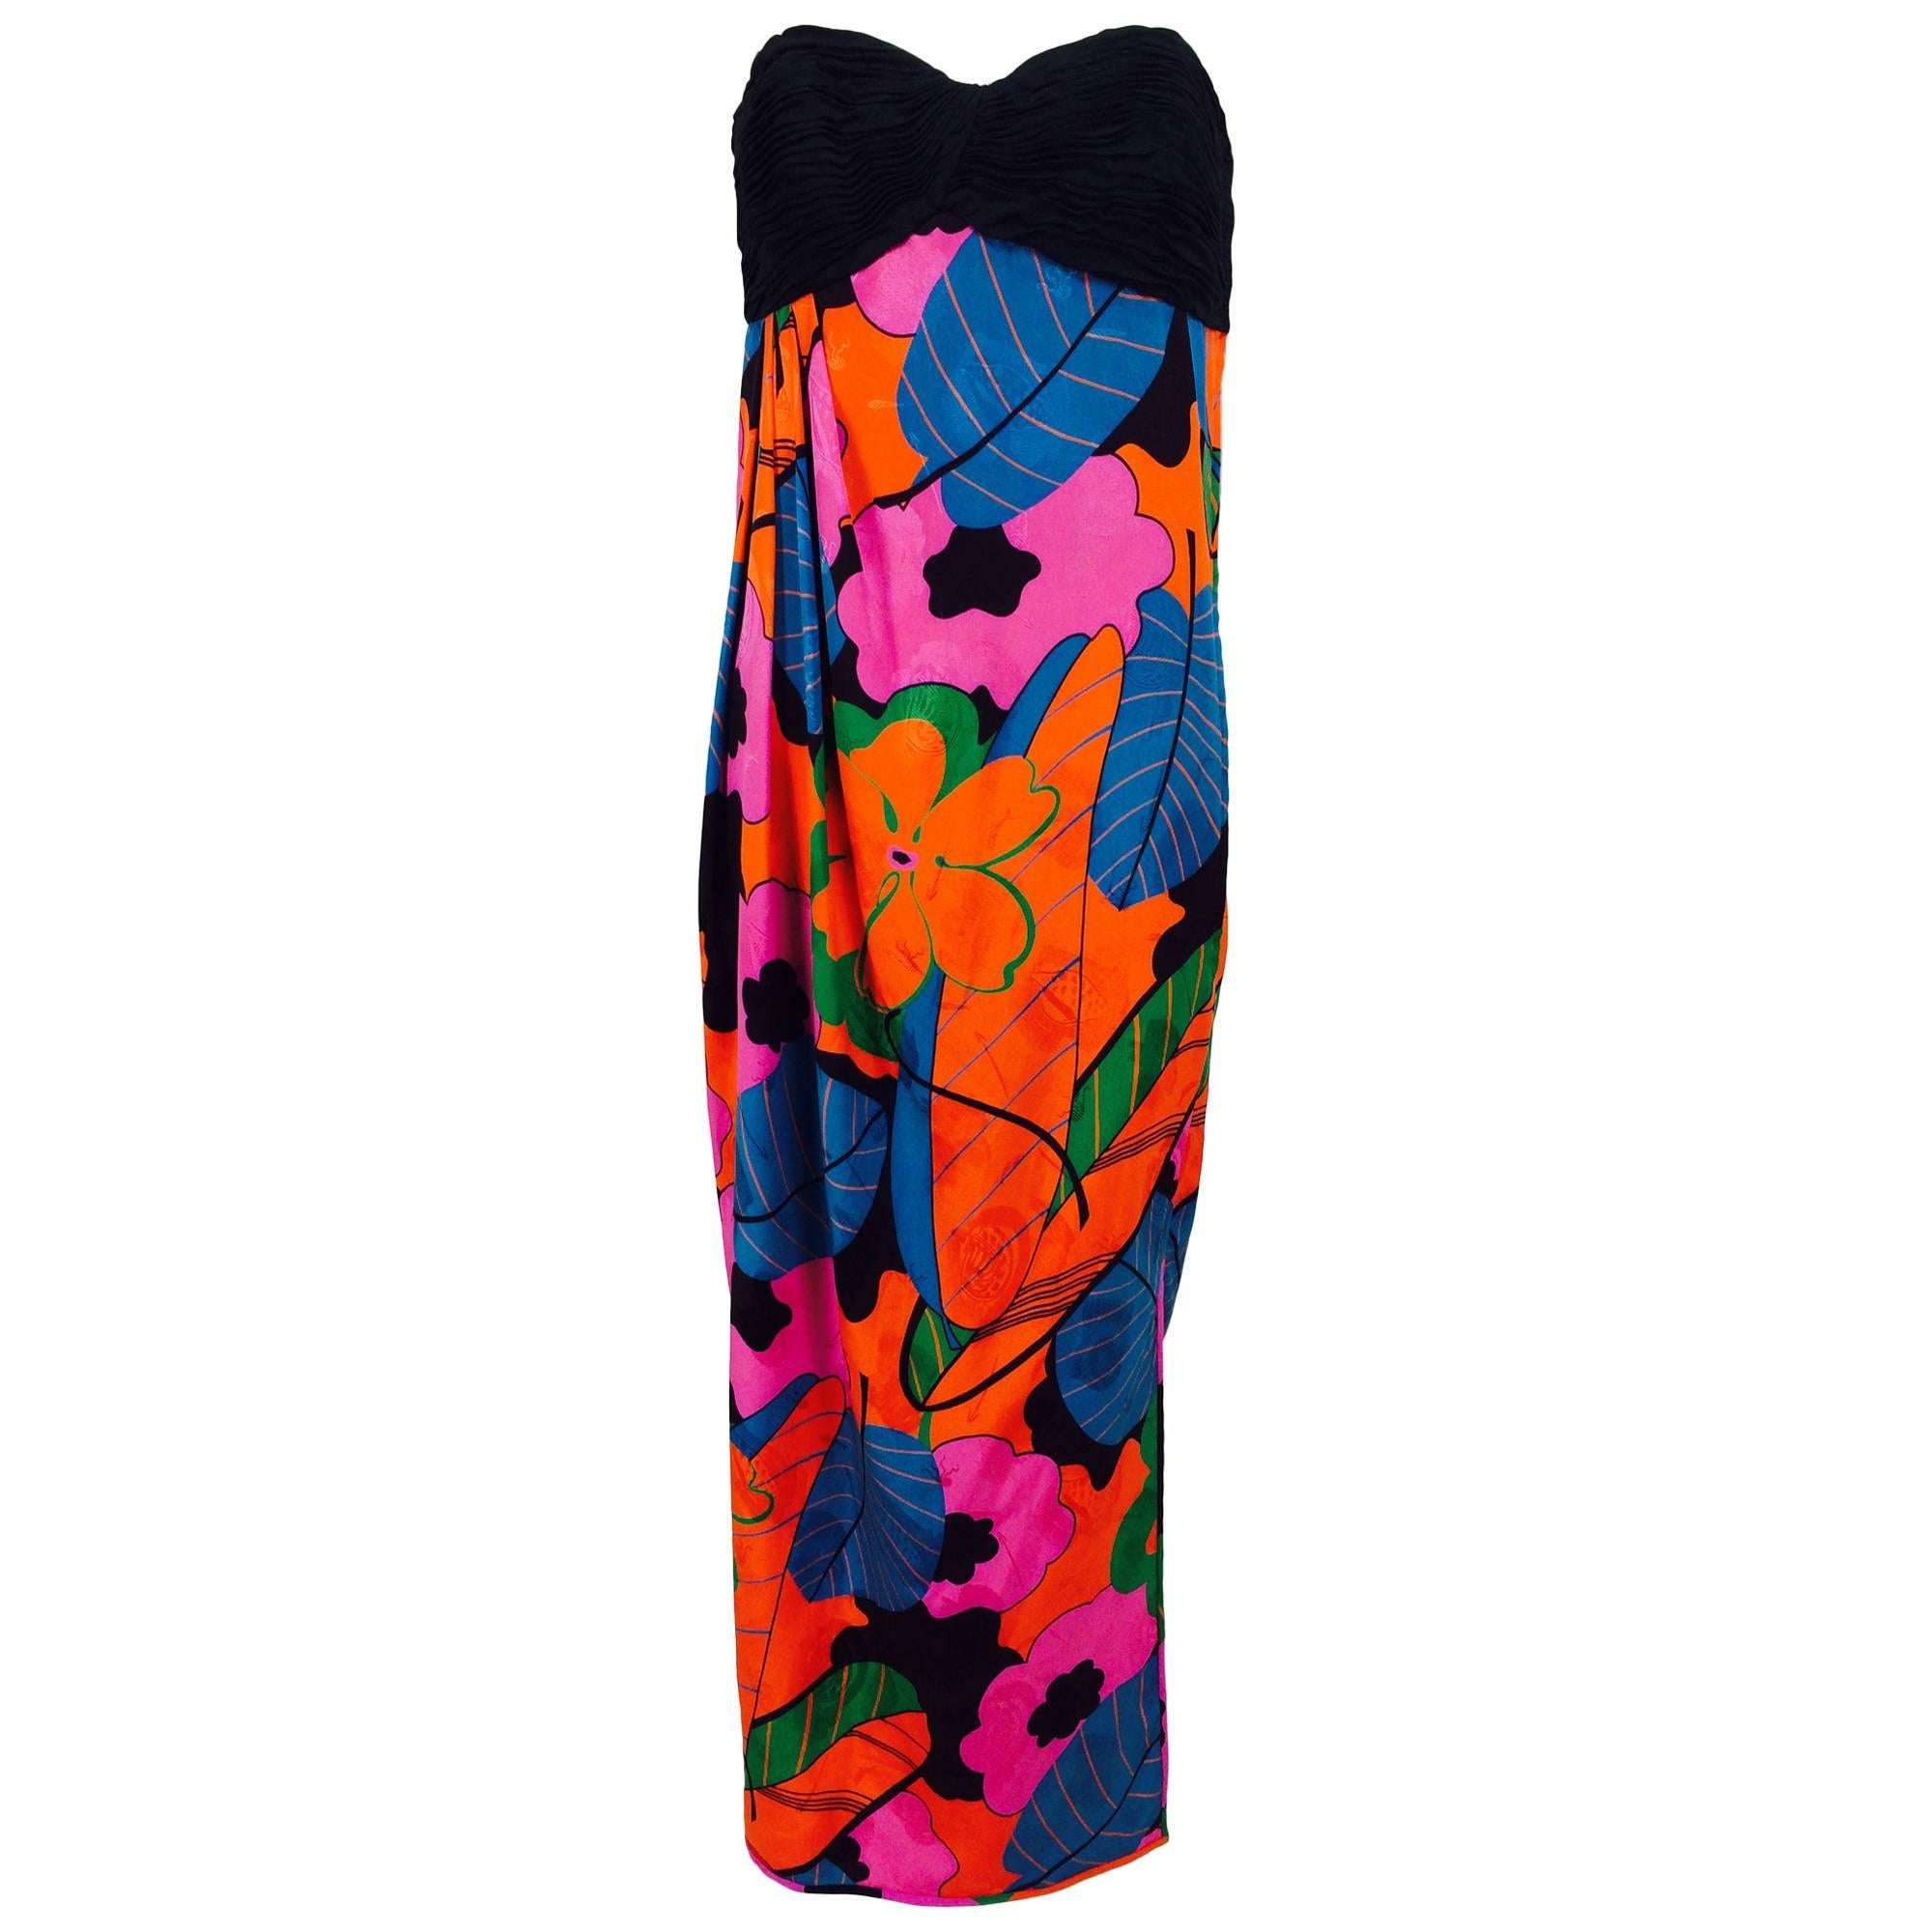 Emanuel Ungaro Parallele Tropical Print Strapless Maxi Dress 1970s